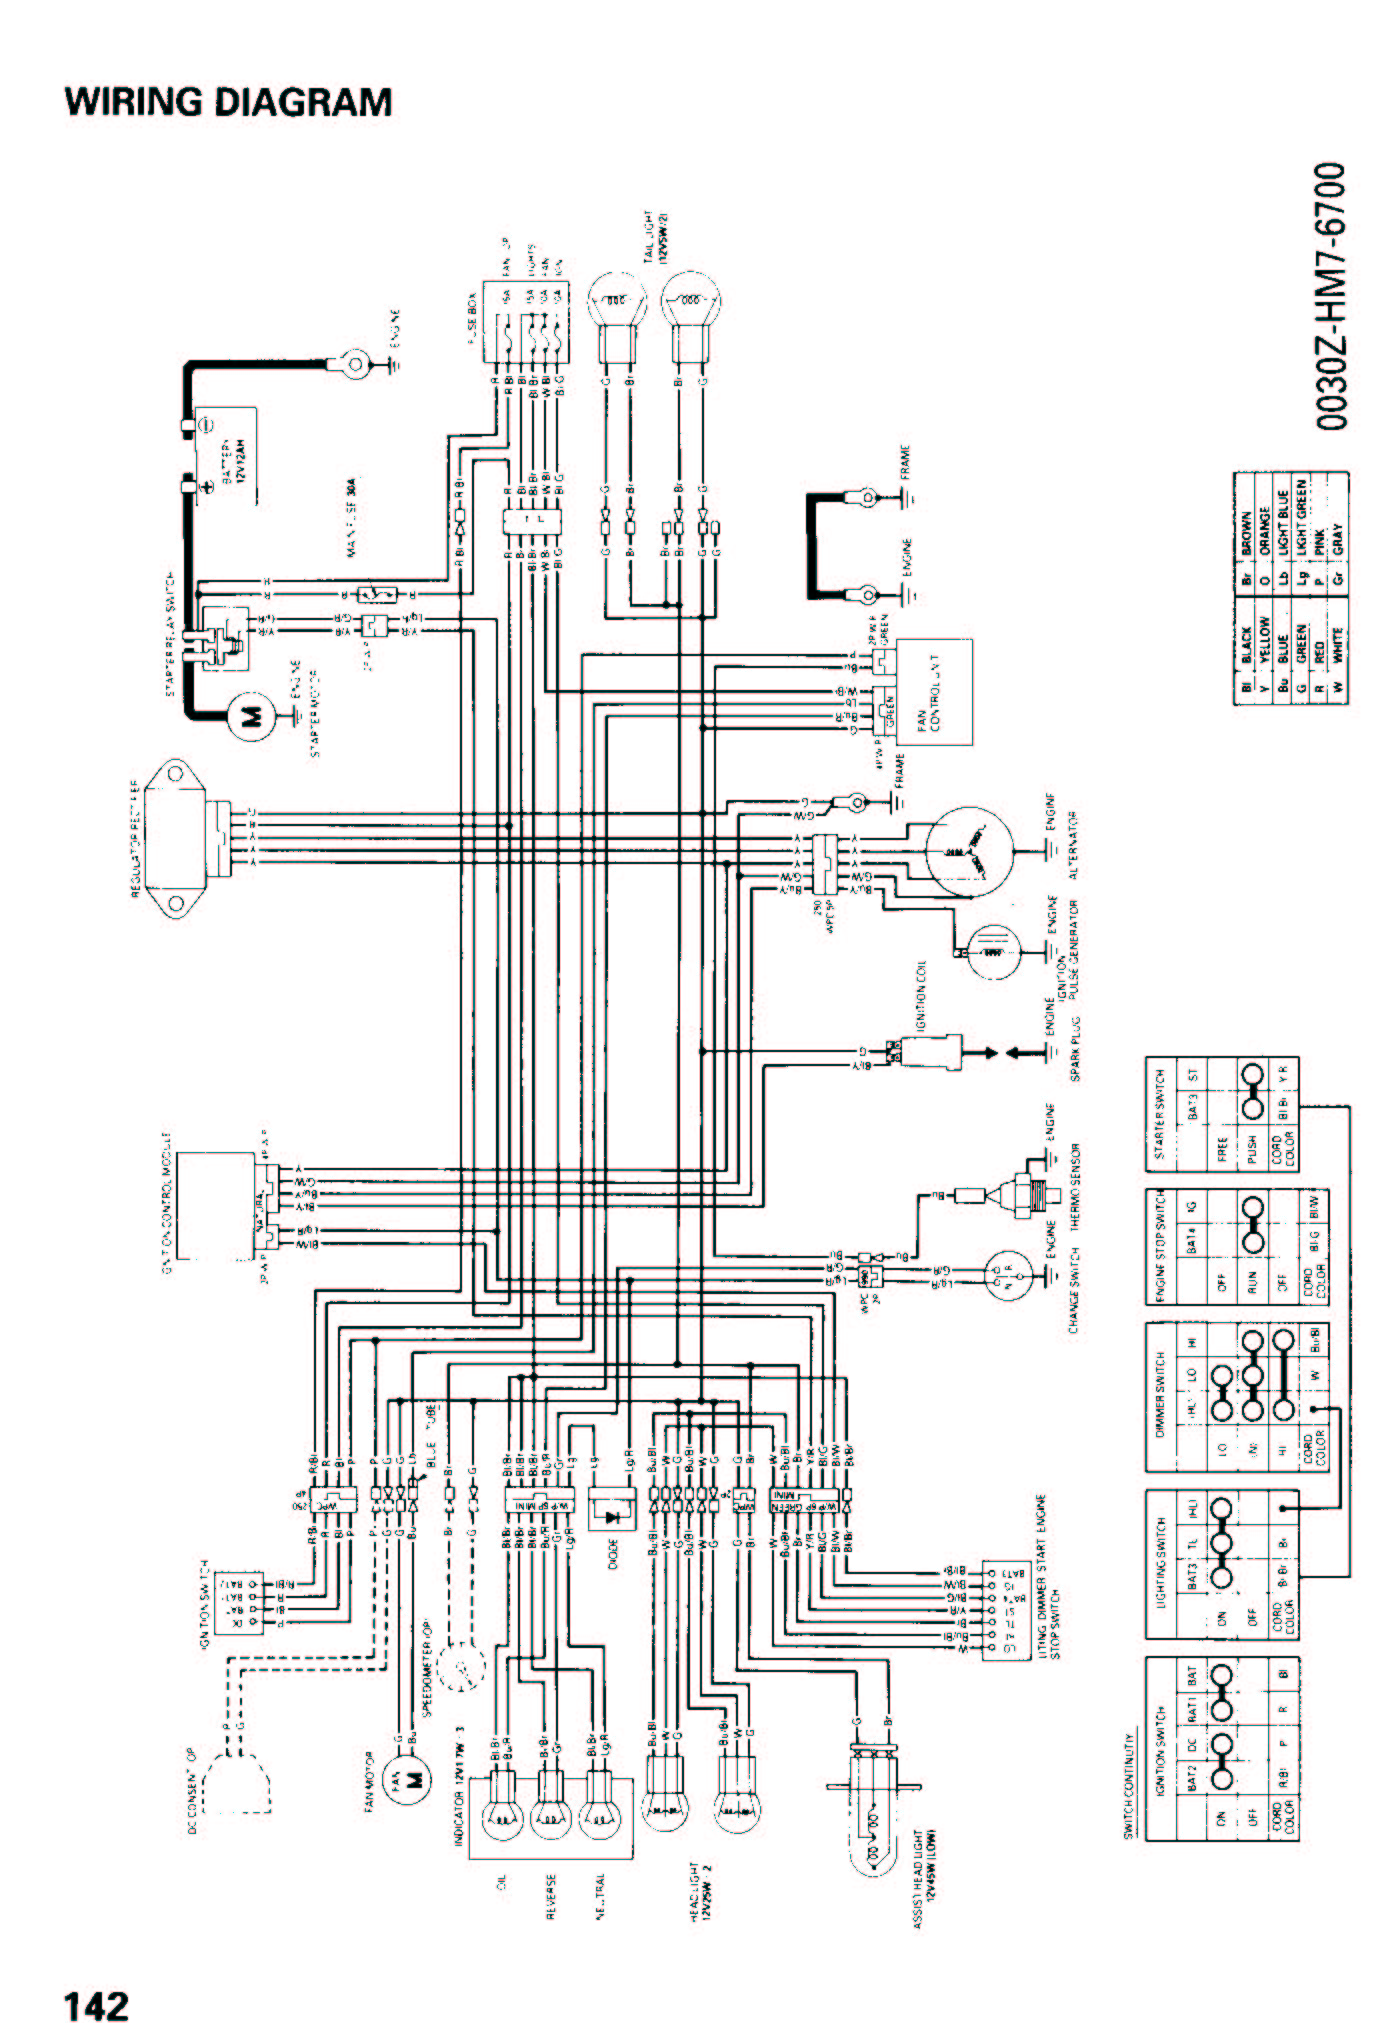 Honda Trx 400 Foreman Wiring Diagram - Fusebox and Wiring Diagram  visualdraw-ton - visualdraw-ton.sirtarghe.it